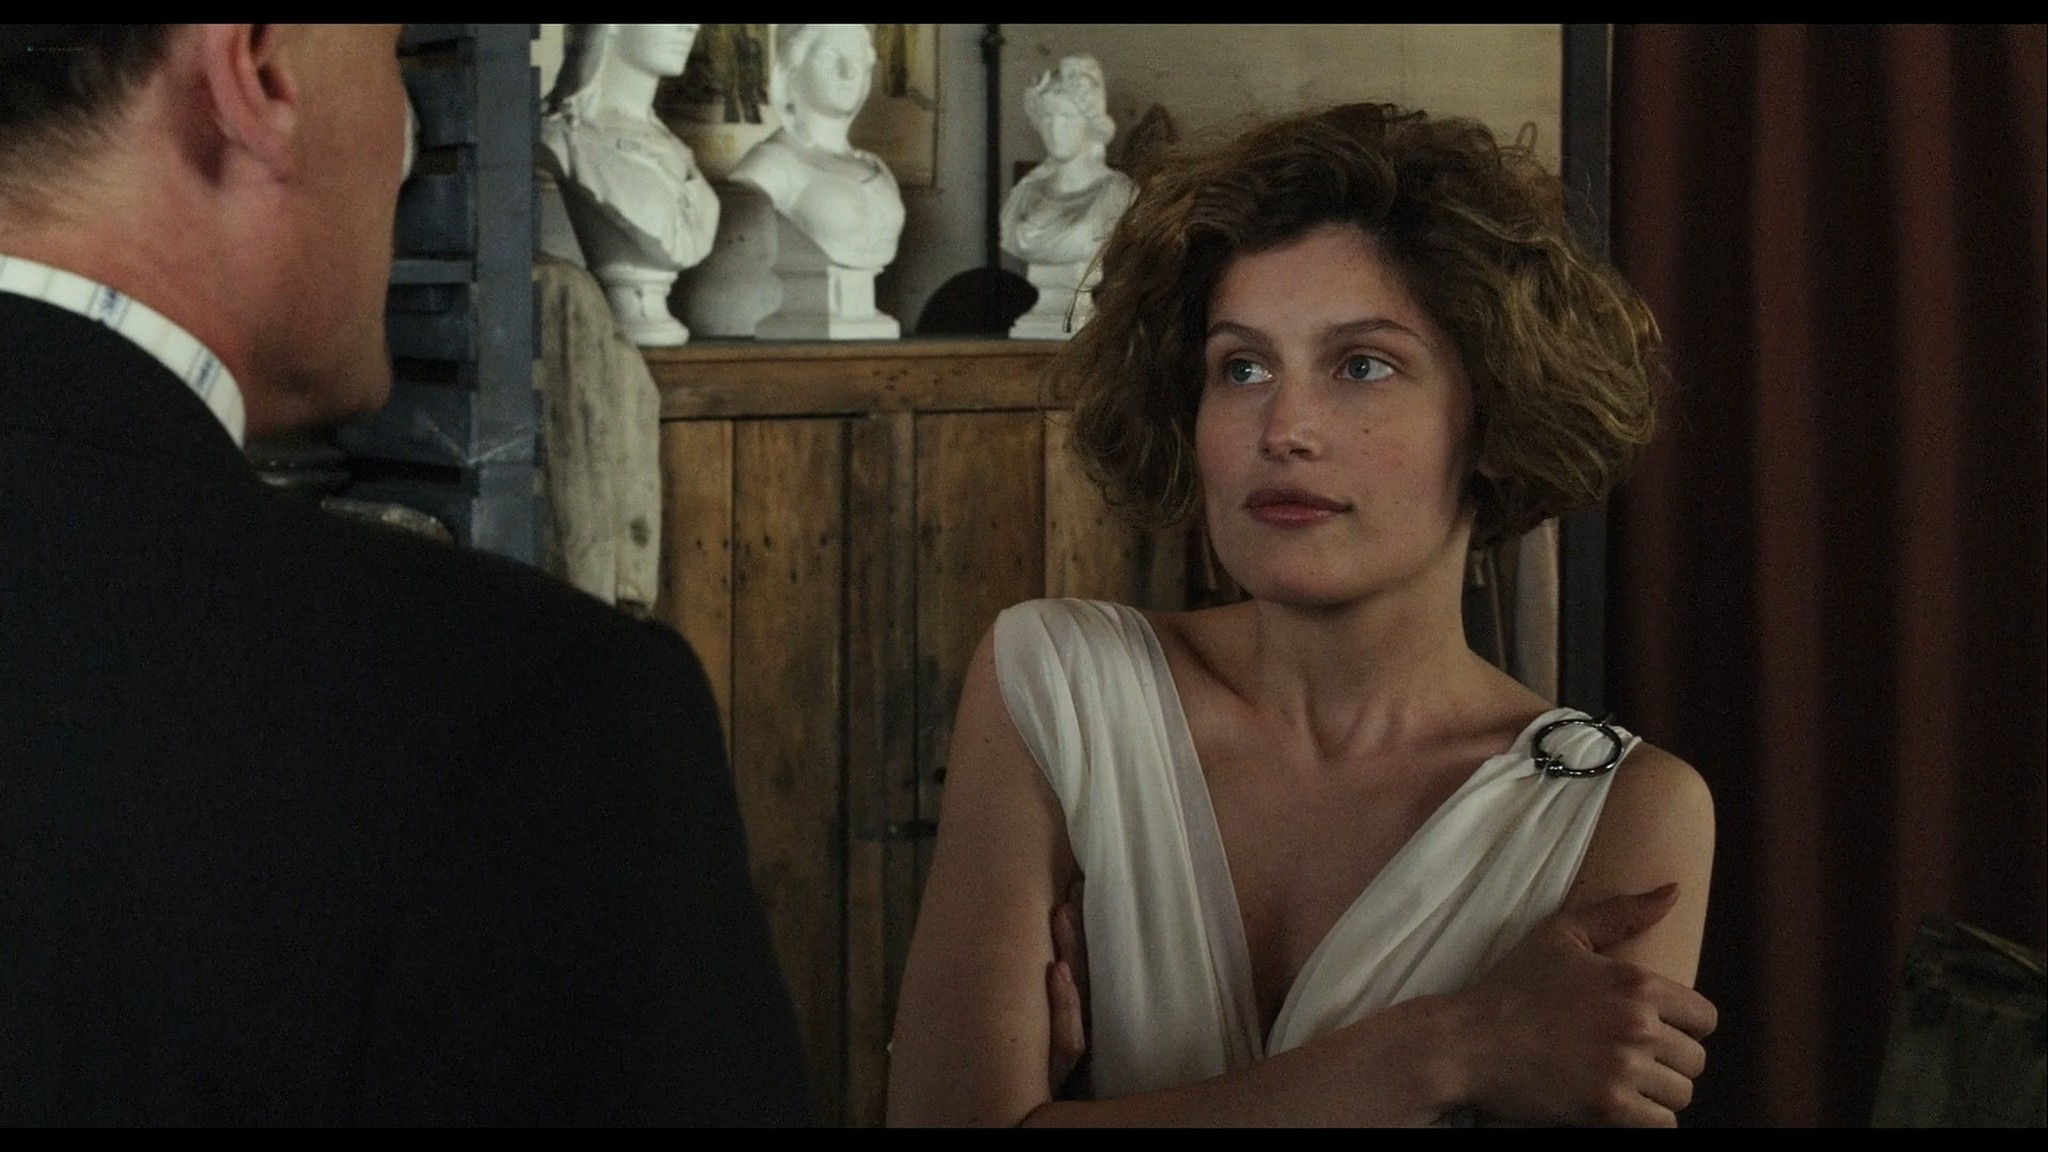 Laetitia Casta nude topless and very hot La jeune fille et les loups 2007 HD 1080p BluRay